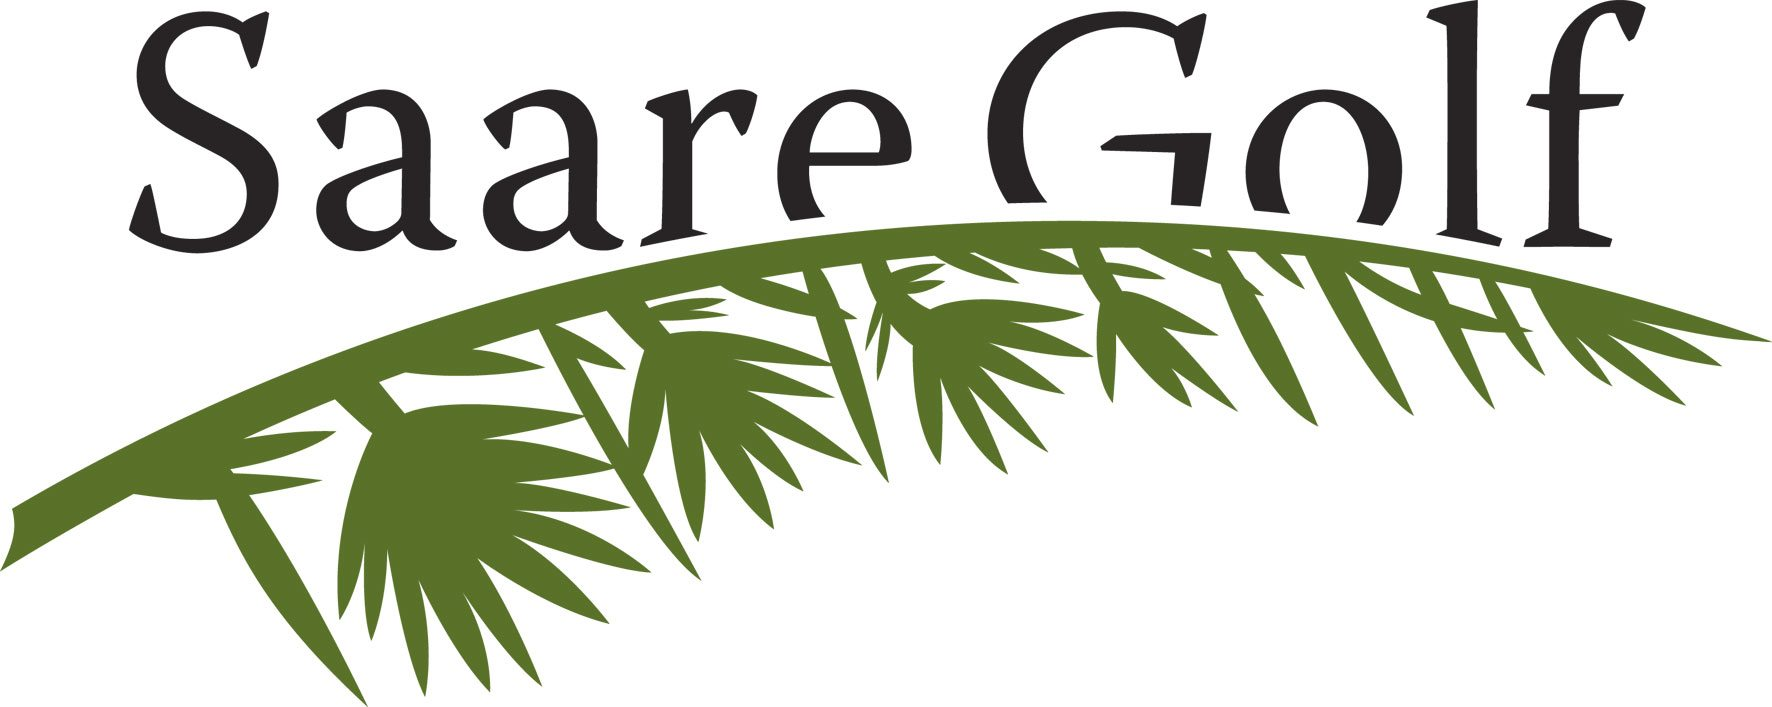 Saare Golf logo